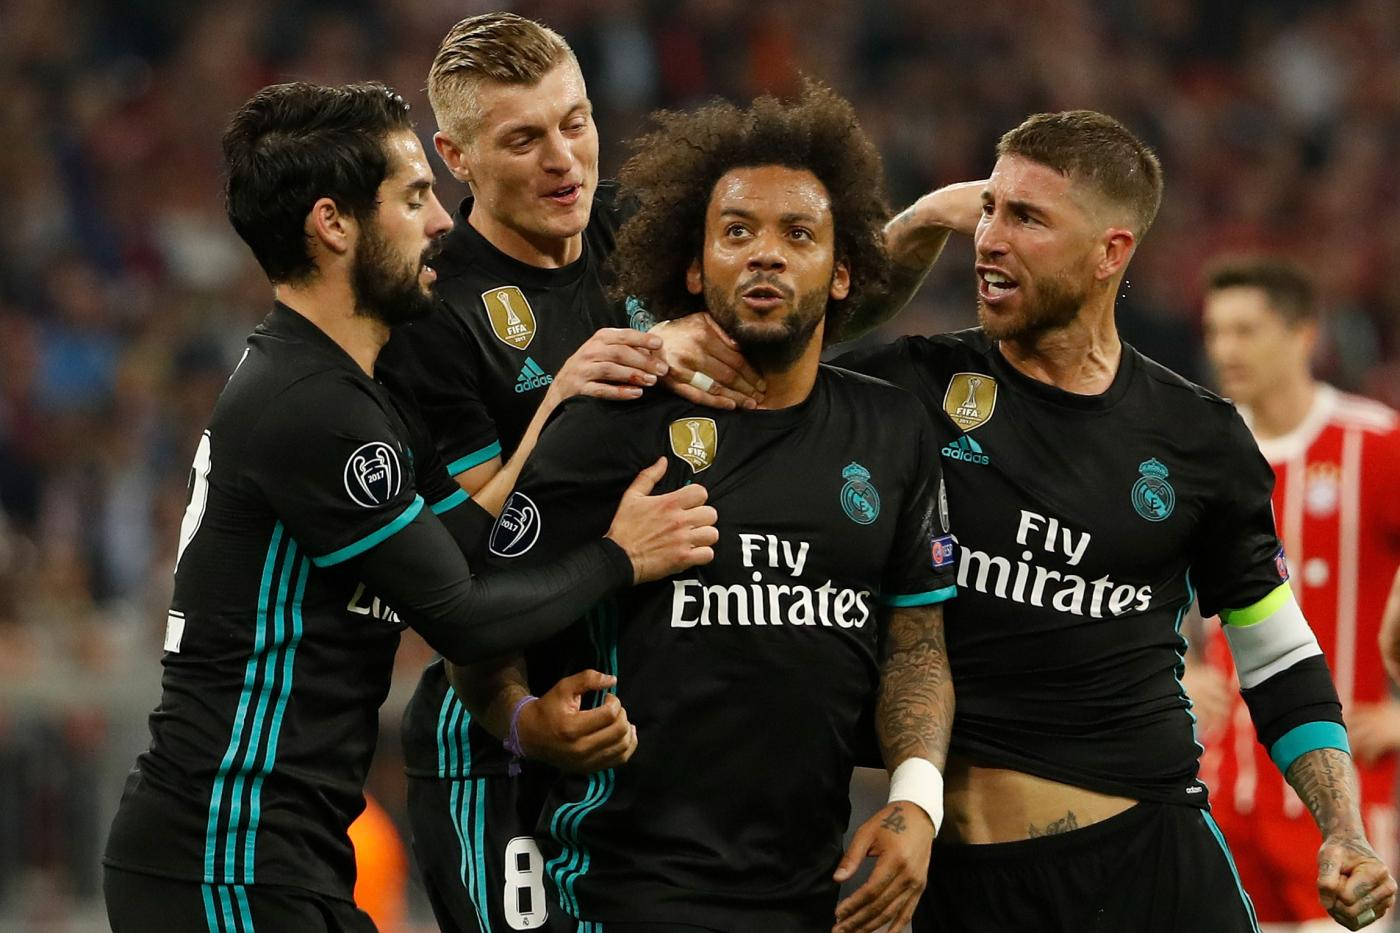 Real Madrid-Atletico Madrid mercoledì 15 agosto